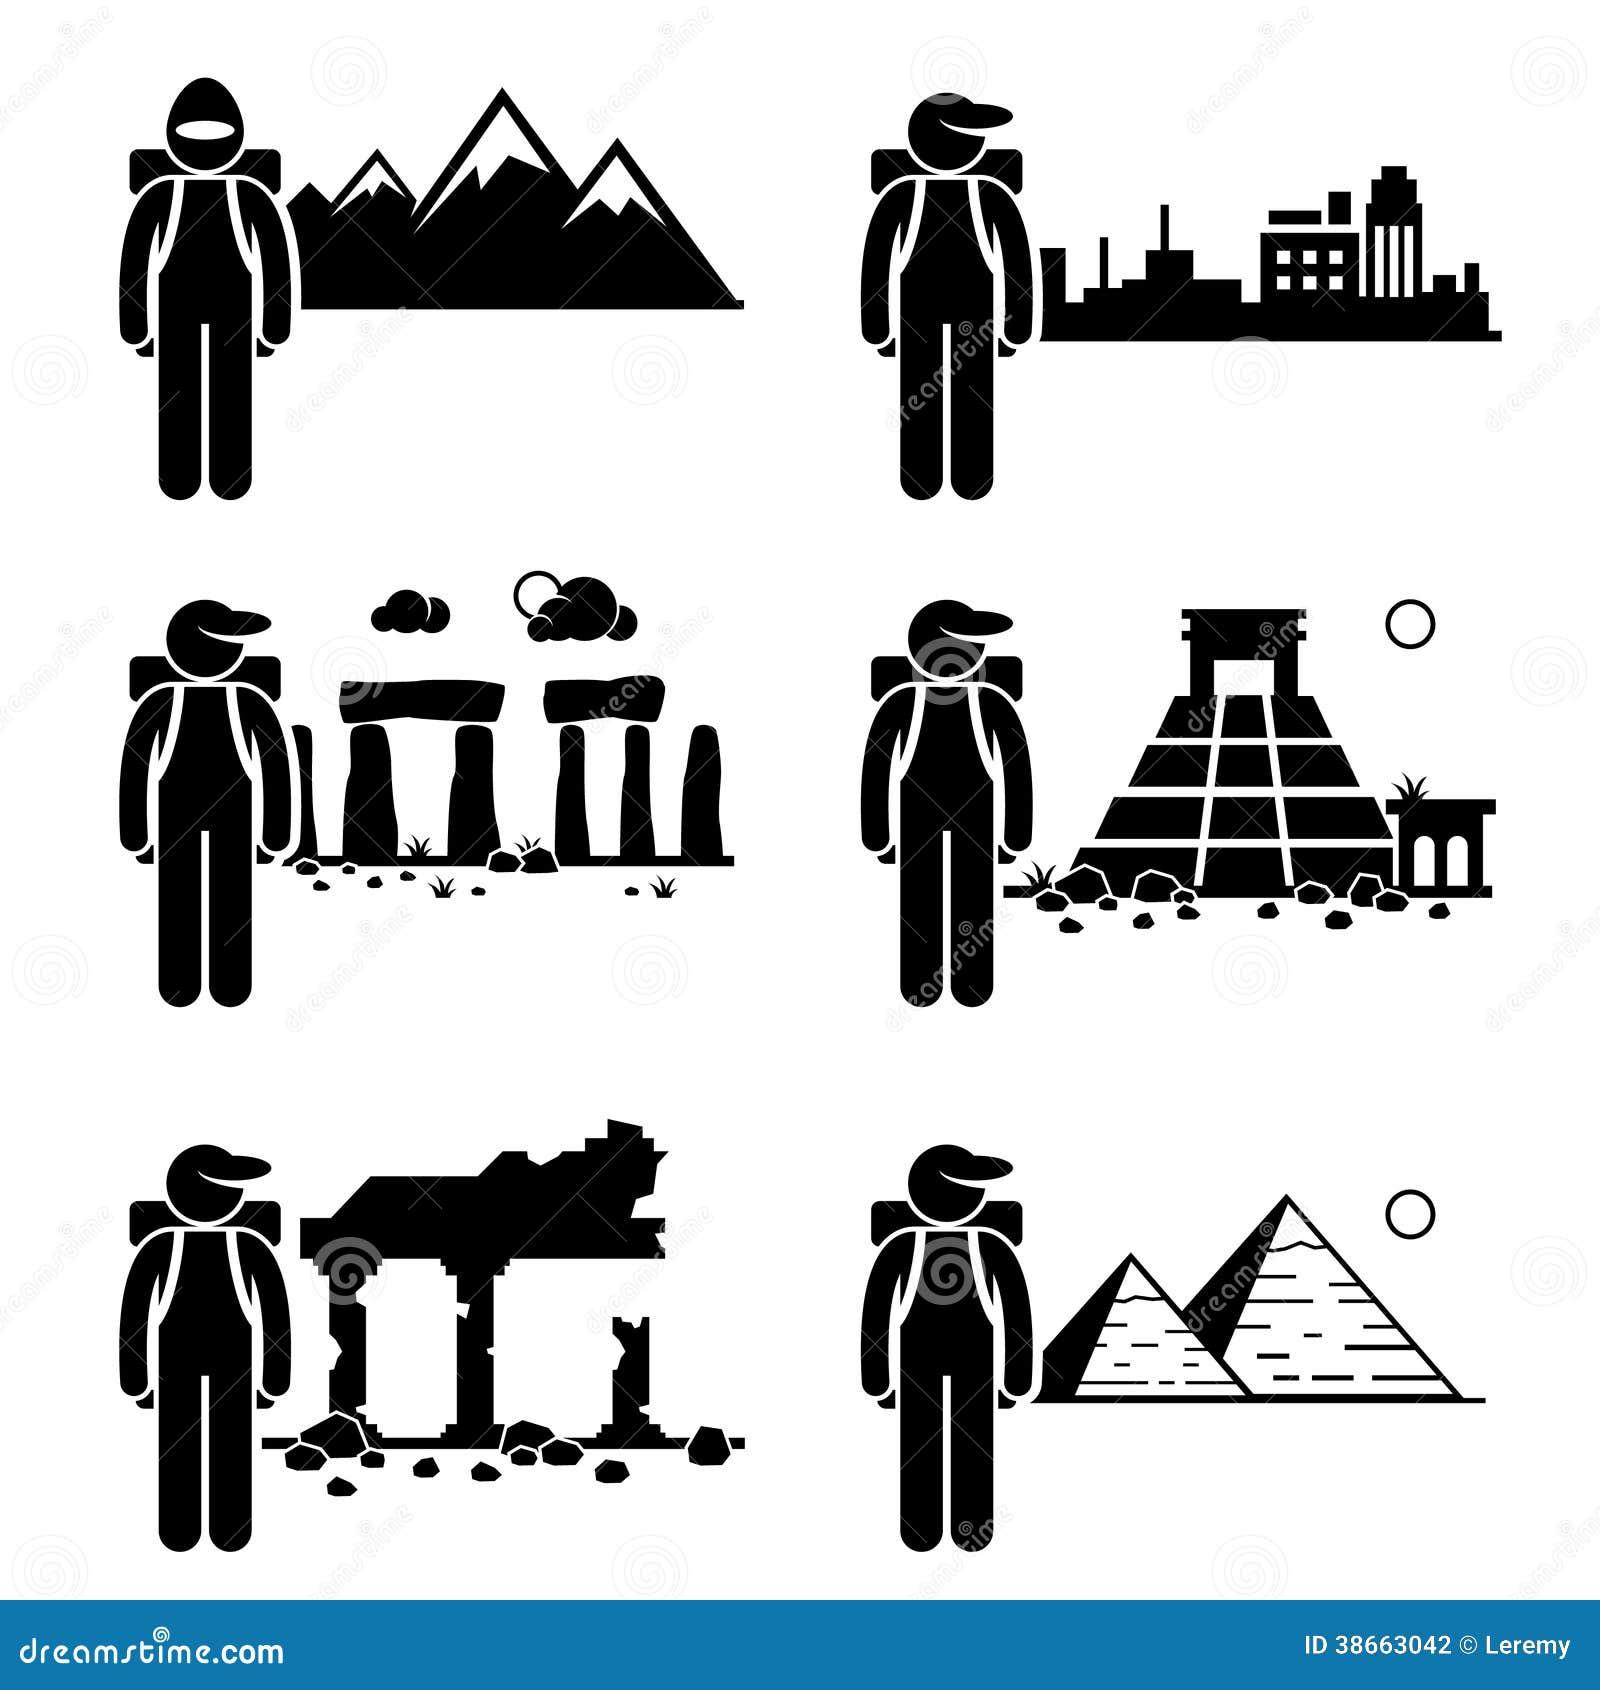 Capital ideas : the improbable origins of modern Wall Street 2012